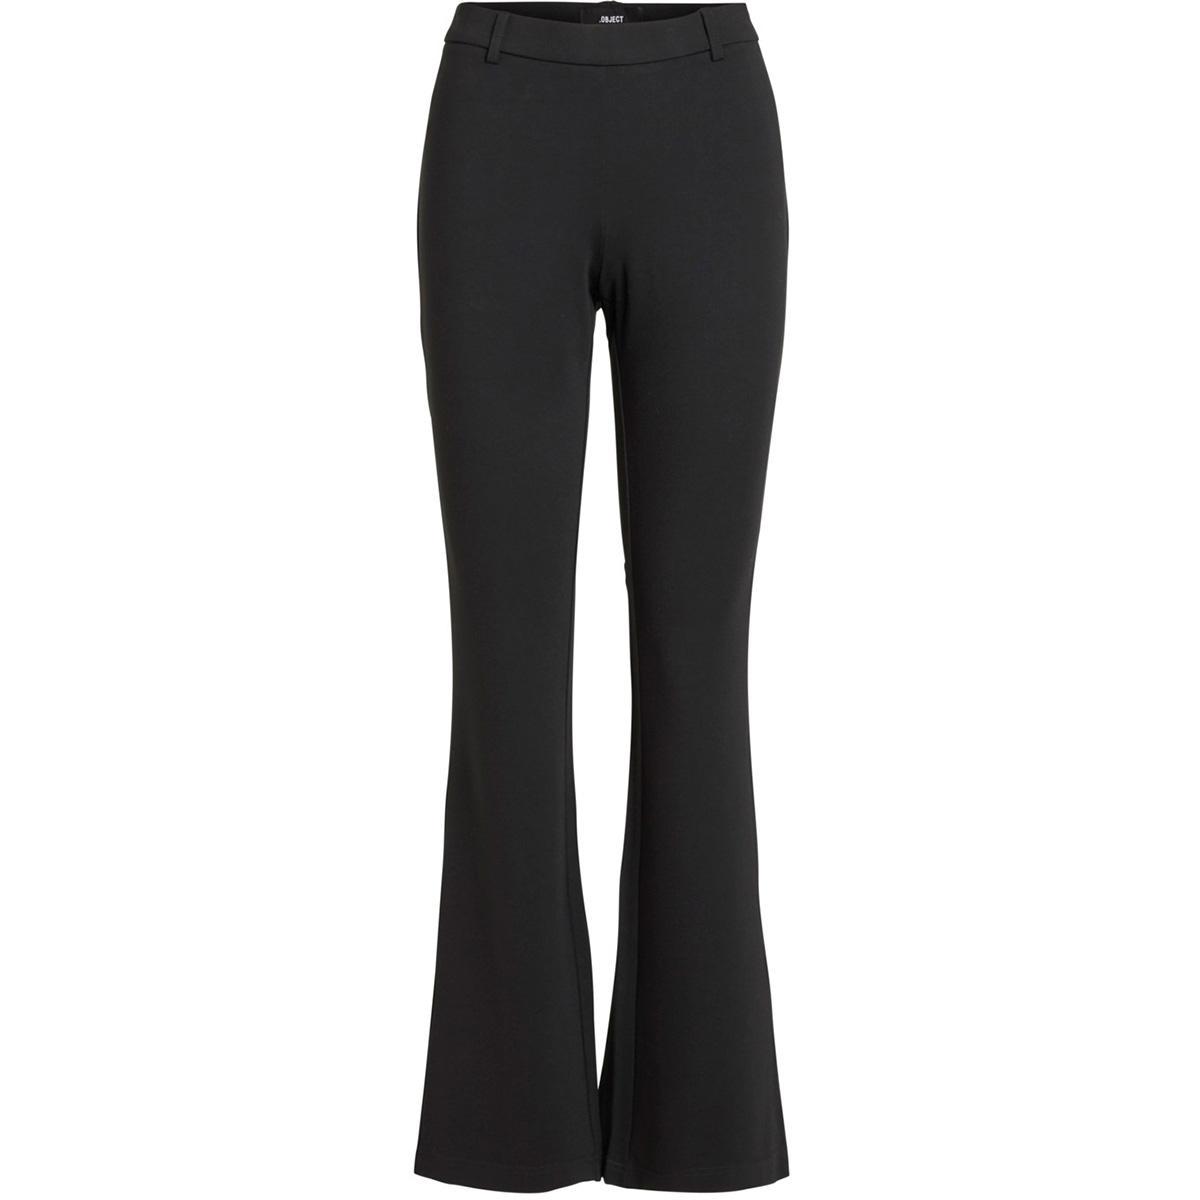 objnicky long flared pant 106 23031691 object broek black